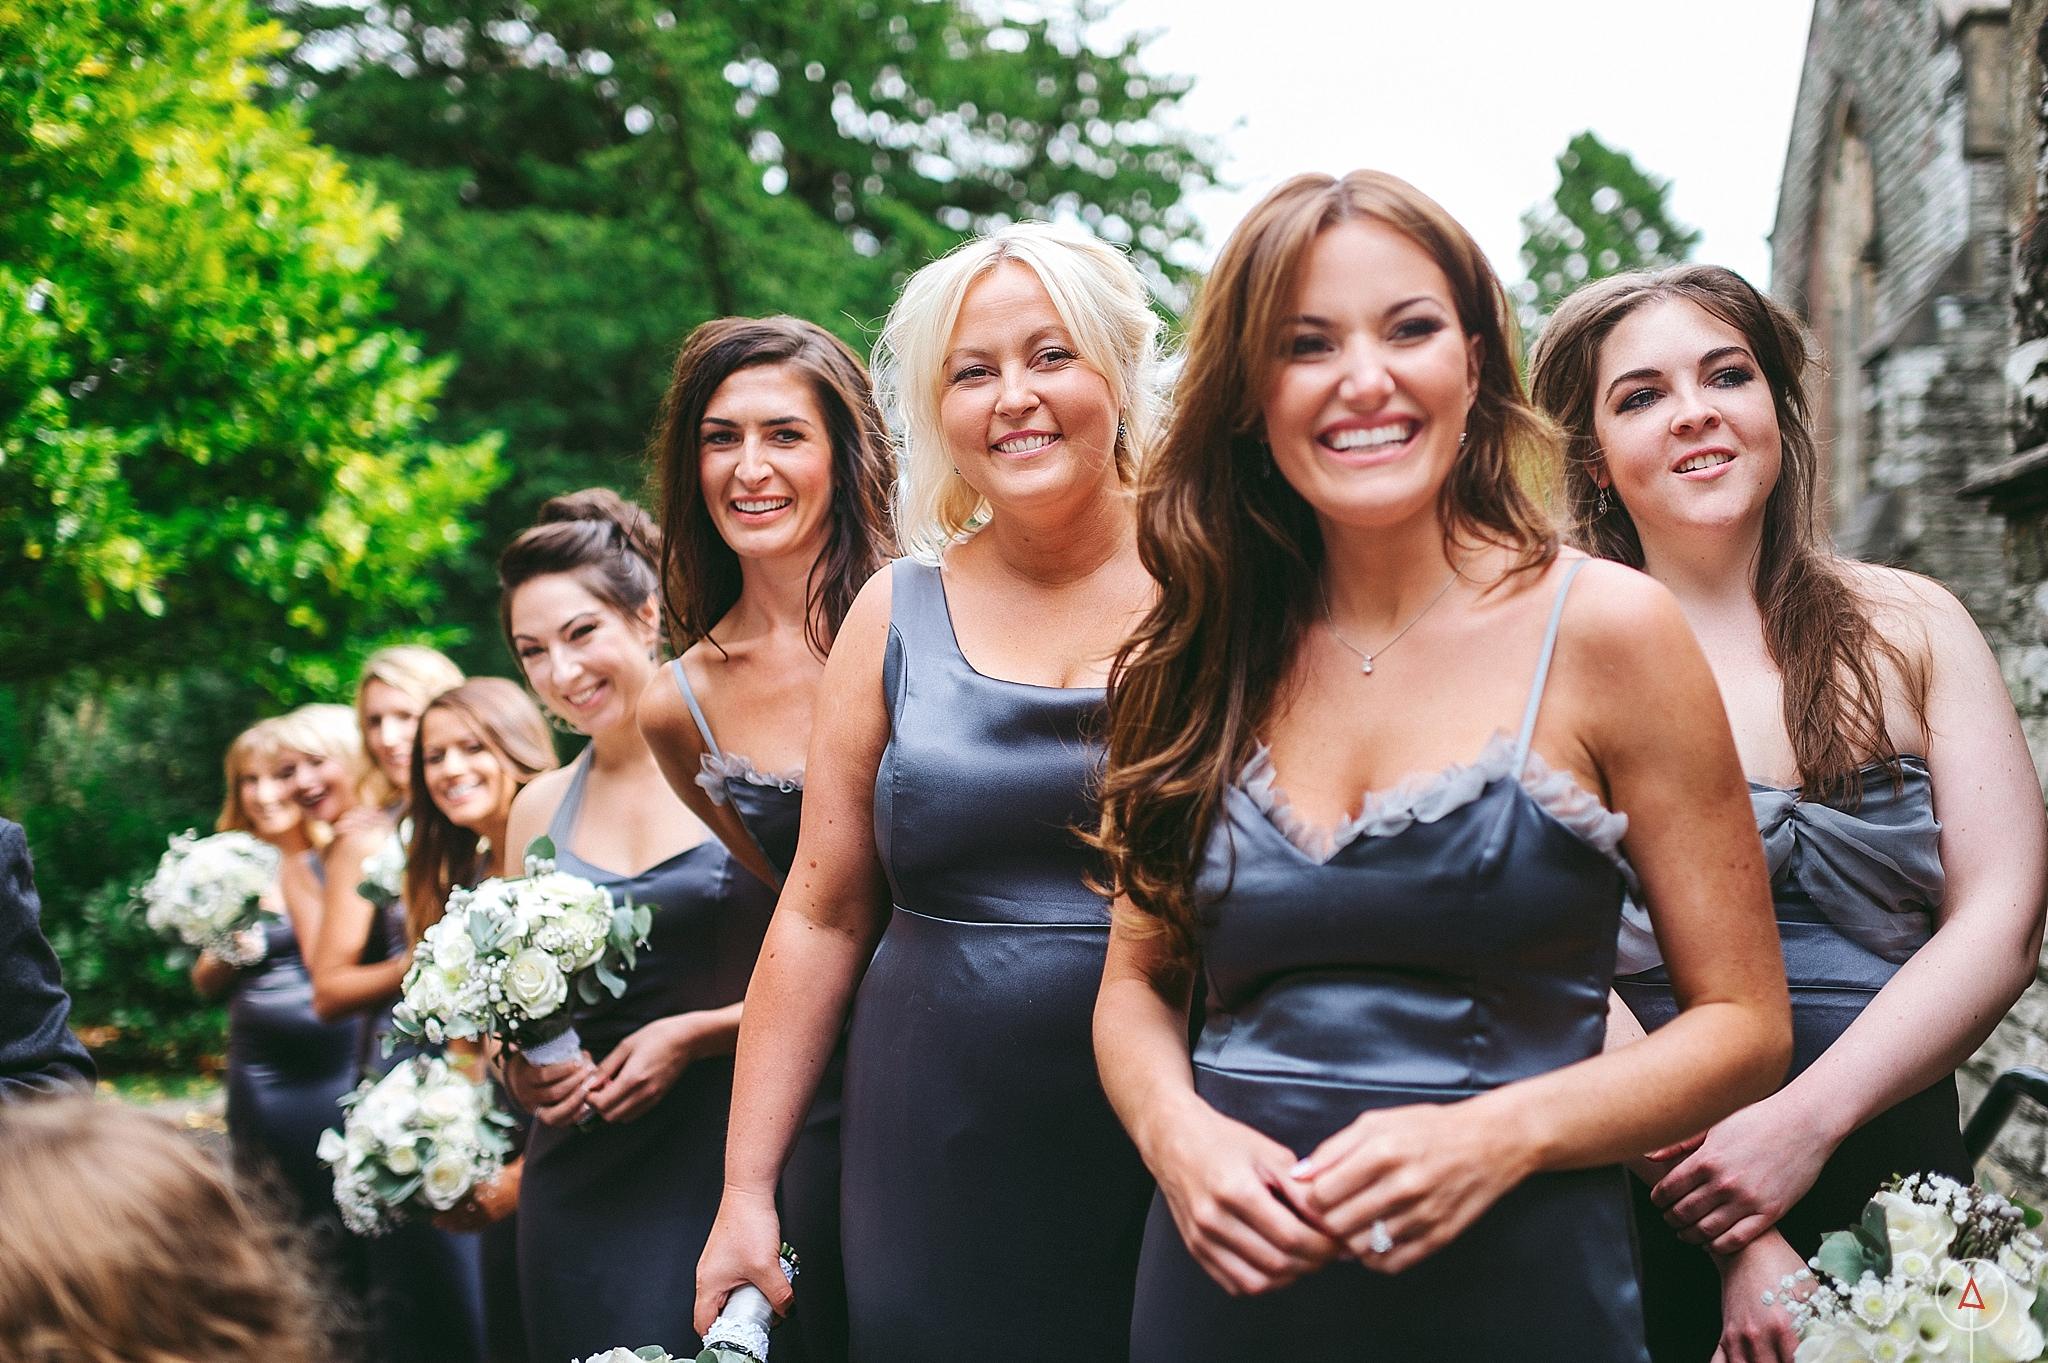 cardiff-wedding-photographer-aga-tomaszek_0356